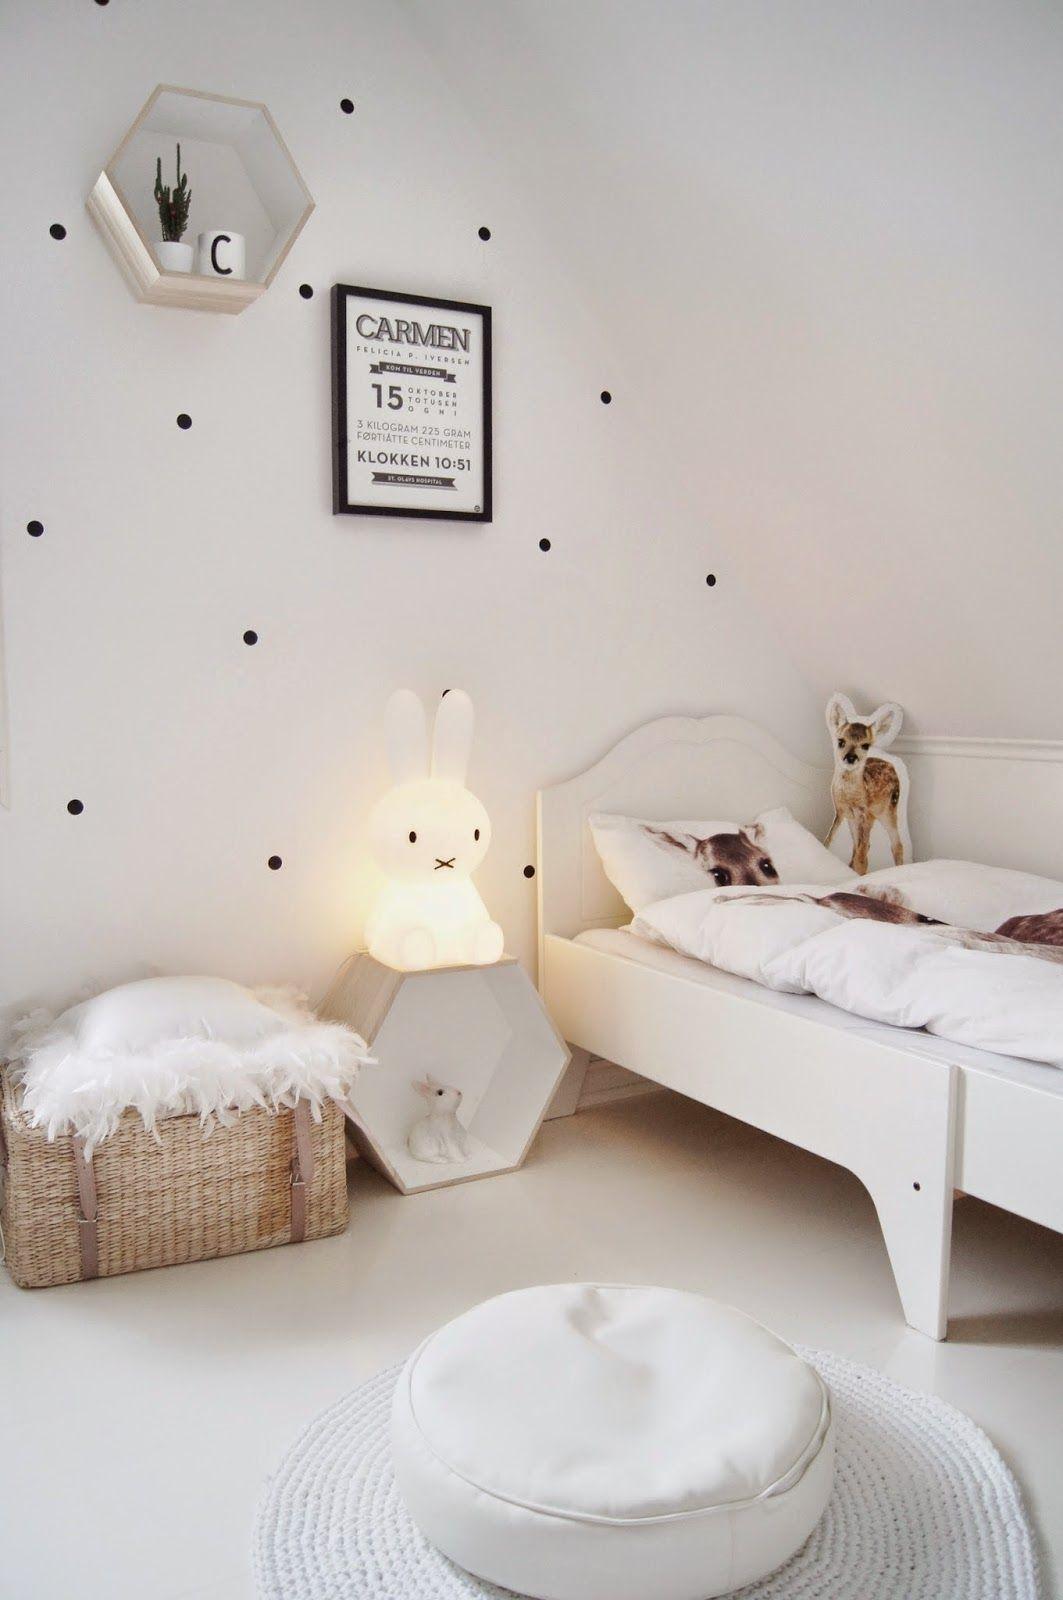 #White #Kidsroom  http://www.kidsdinge.com   https://www.facebook.com/pages/kidsdingecom-Origineel-speelgoed-hebbedingen-voor-hippe-kids/160122710686387?sk=wall   http://instagram.com/kidsdinge